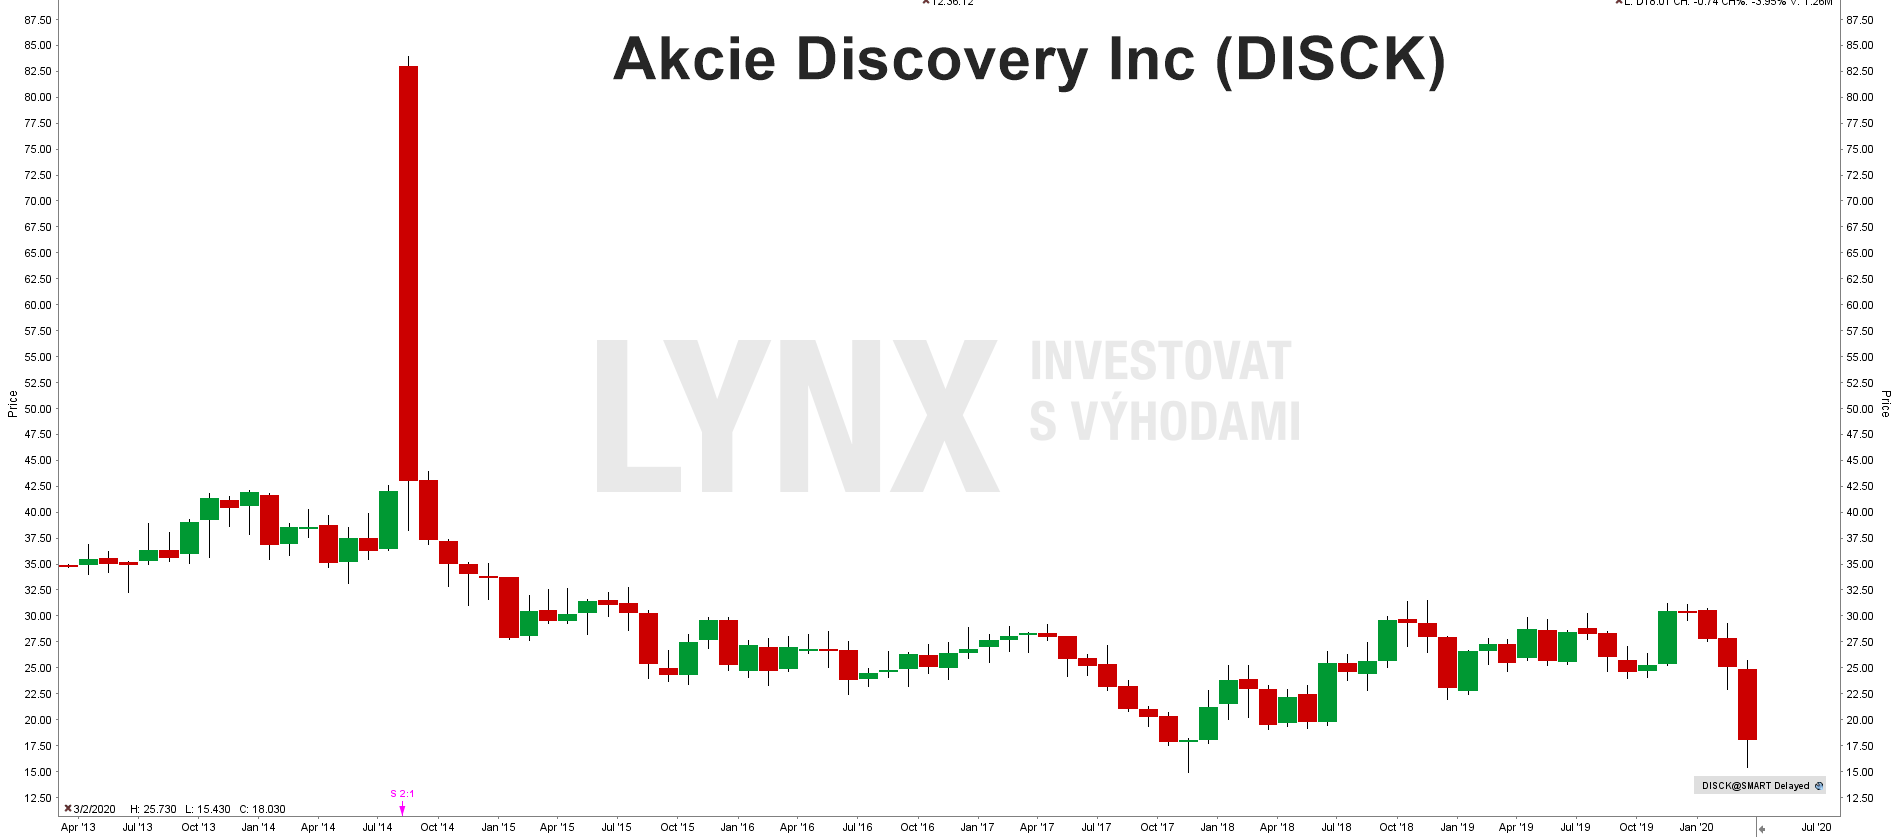 Akcie Discovery Inc (DISCK)